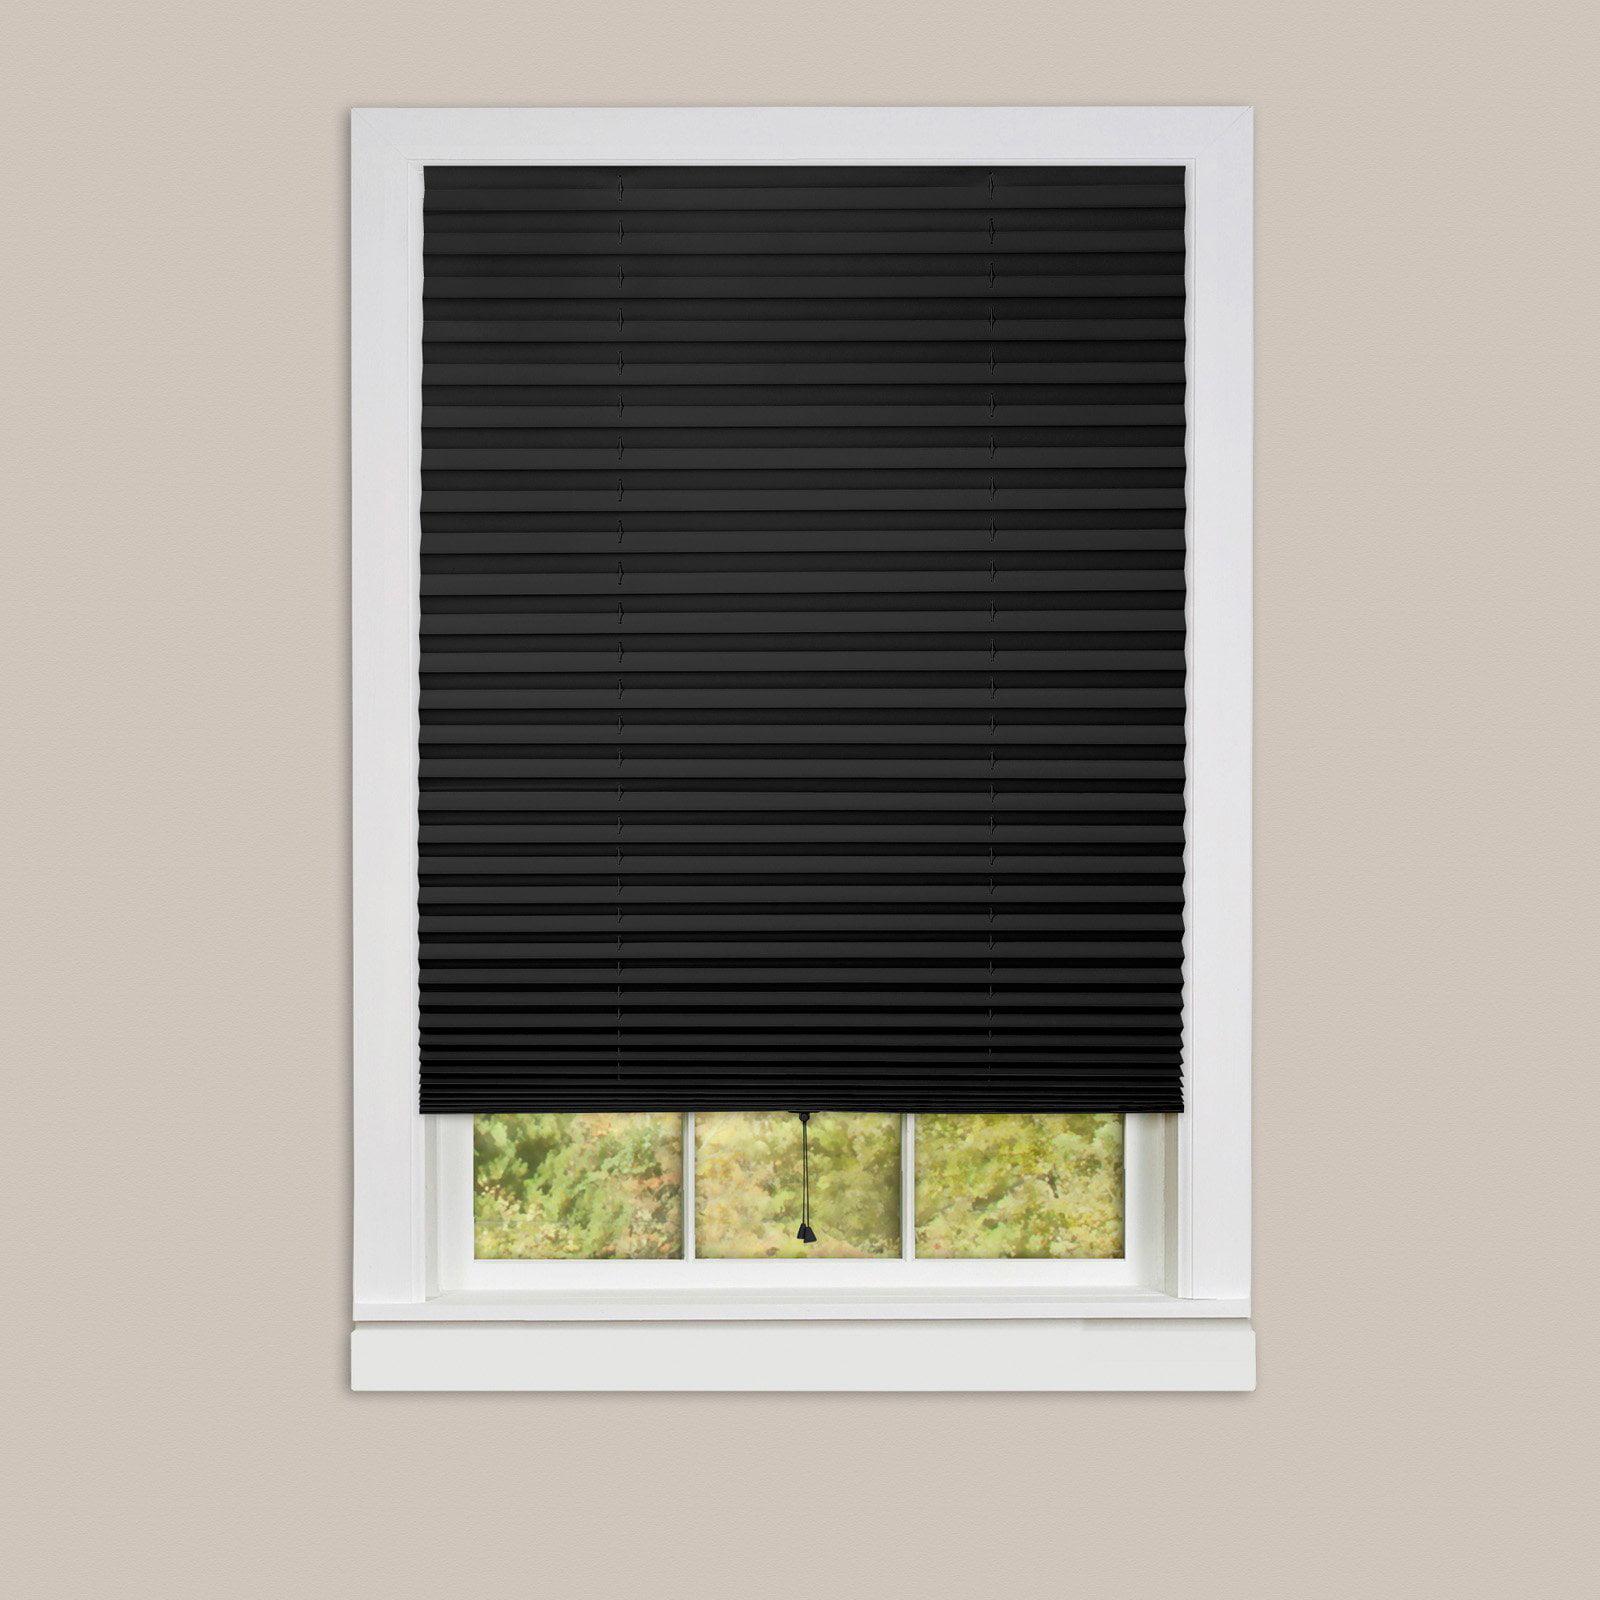 1-2-3 Vinyl Room Darkening Temporary Pleated Window Shade